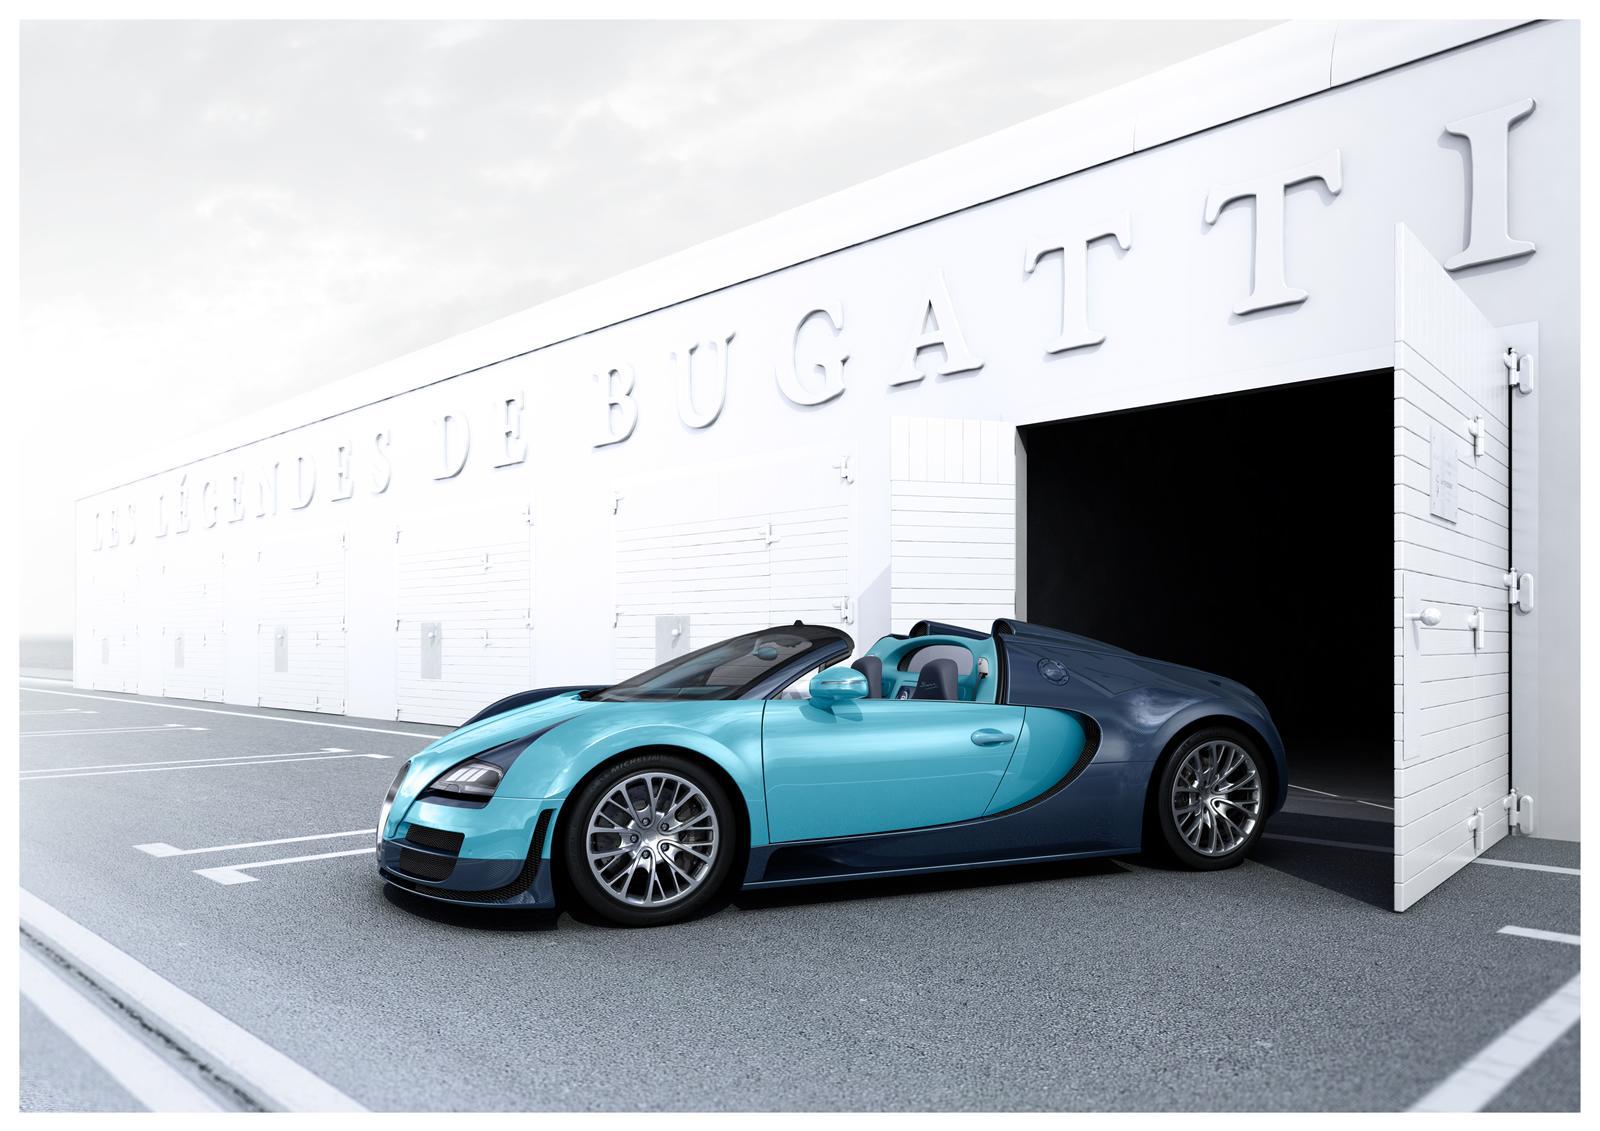 bugatti launches new limited edition veyron autoevolution. Black Bedroom Furniture Sets. Home Design Ideas